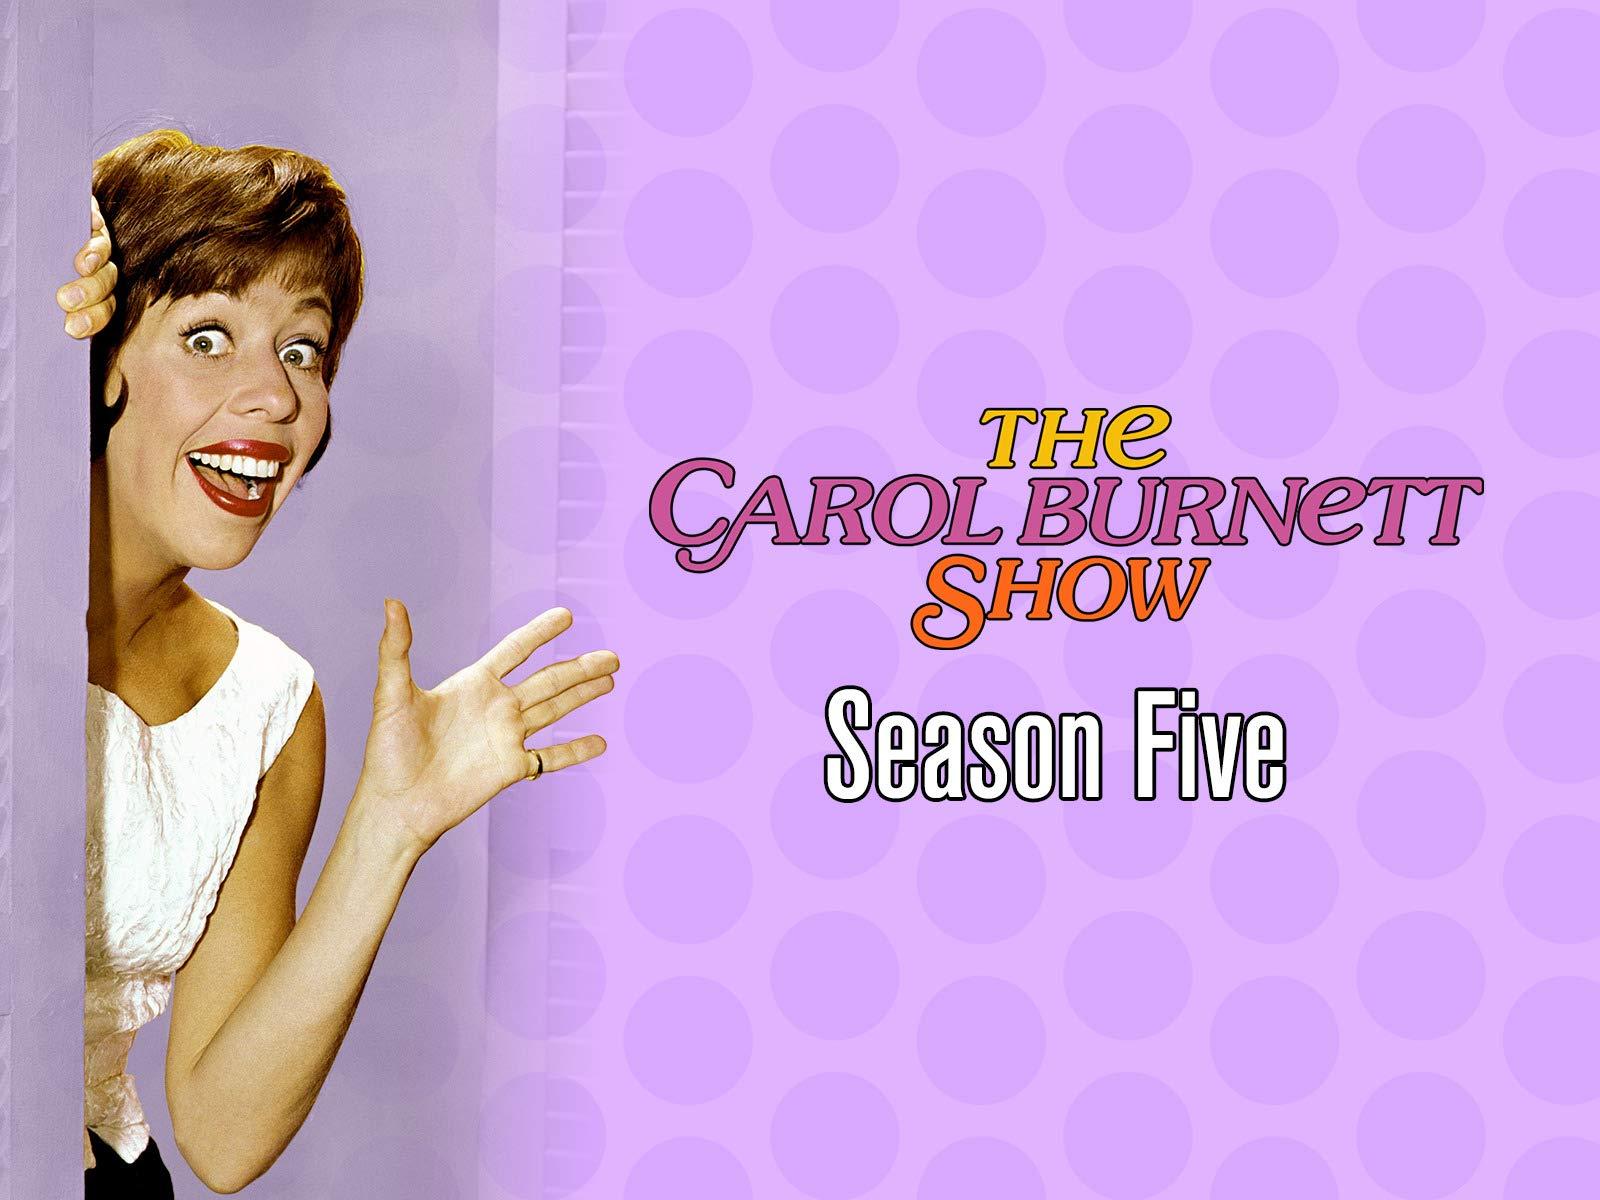 The Carol Burnett Show - Season 5